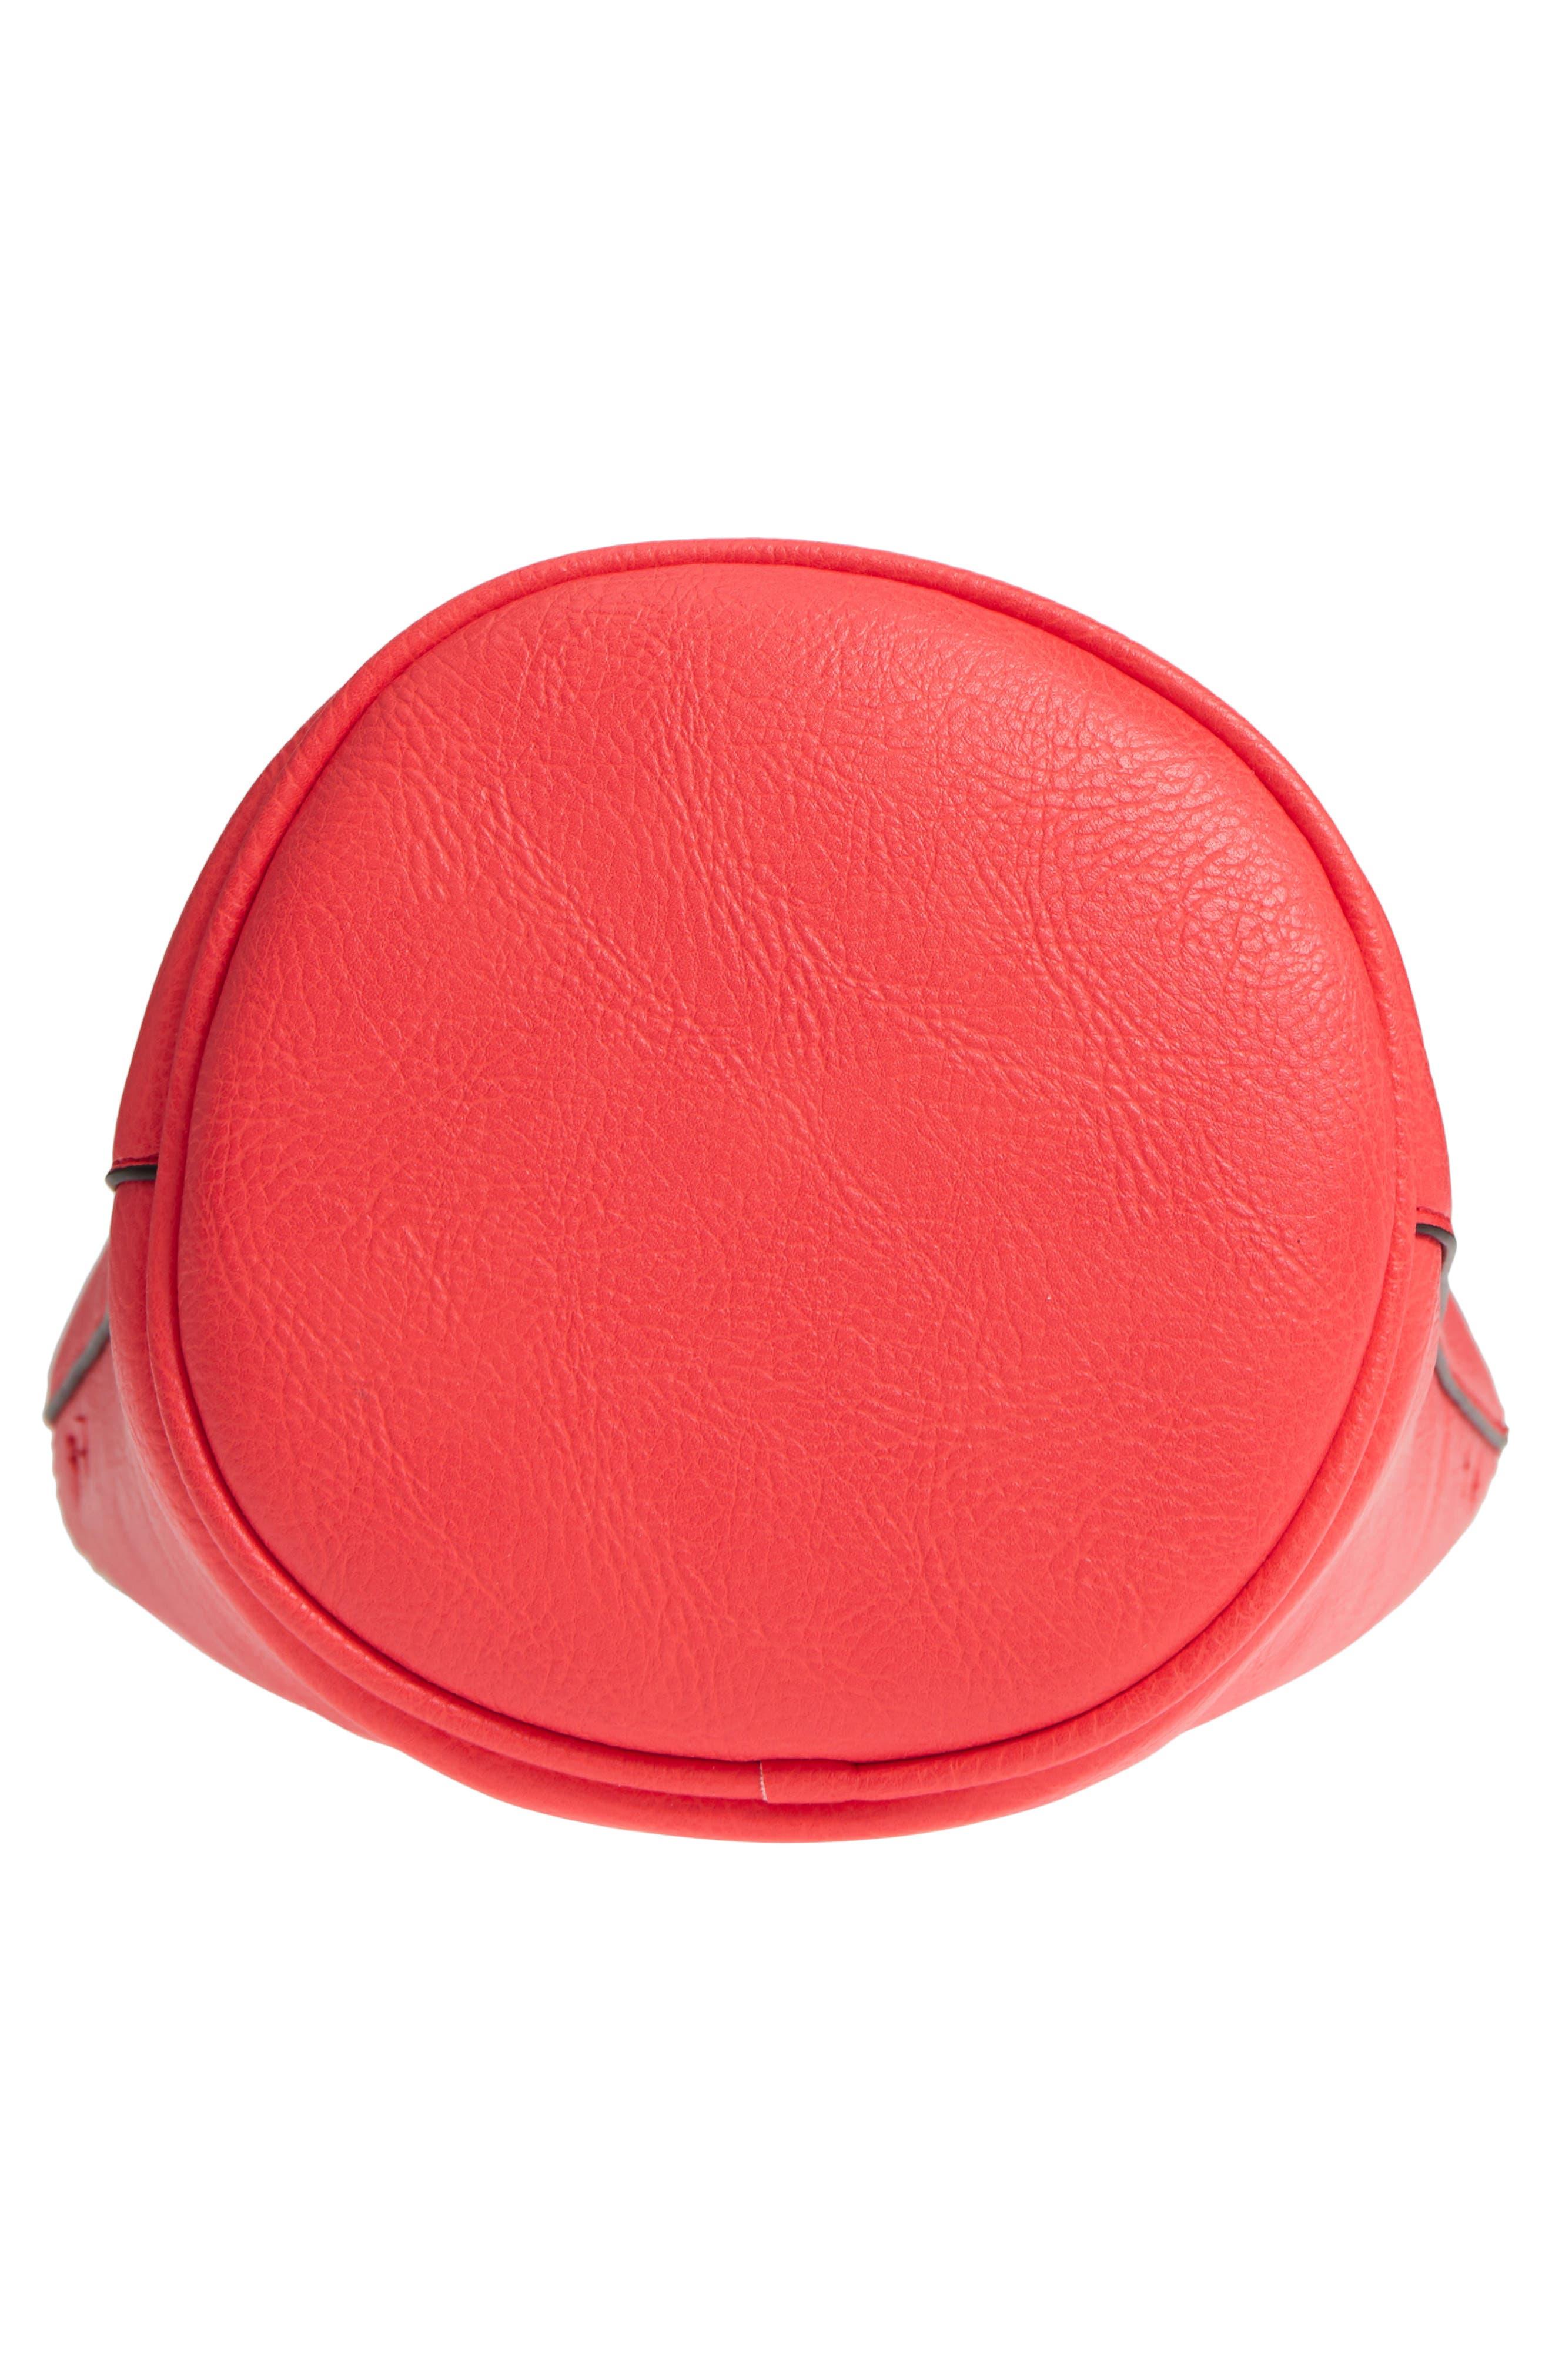 Mali + Lili Ilia Vegan Leather Ring Handle Bucket Bag,                             Alternate thumbnail 18, color,